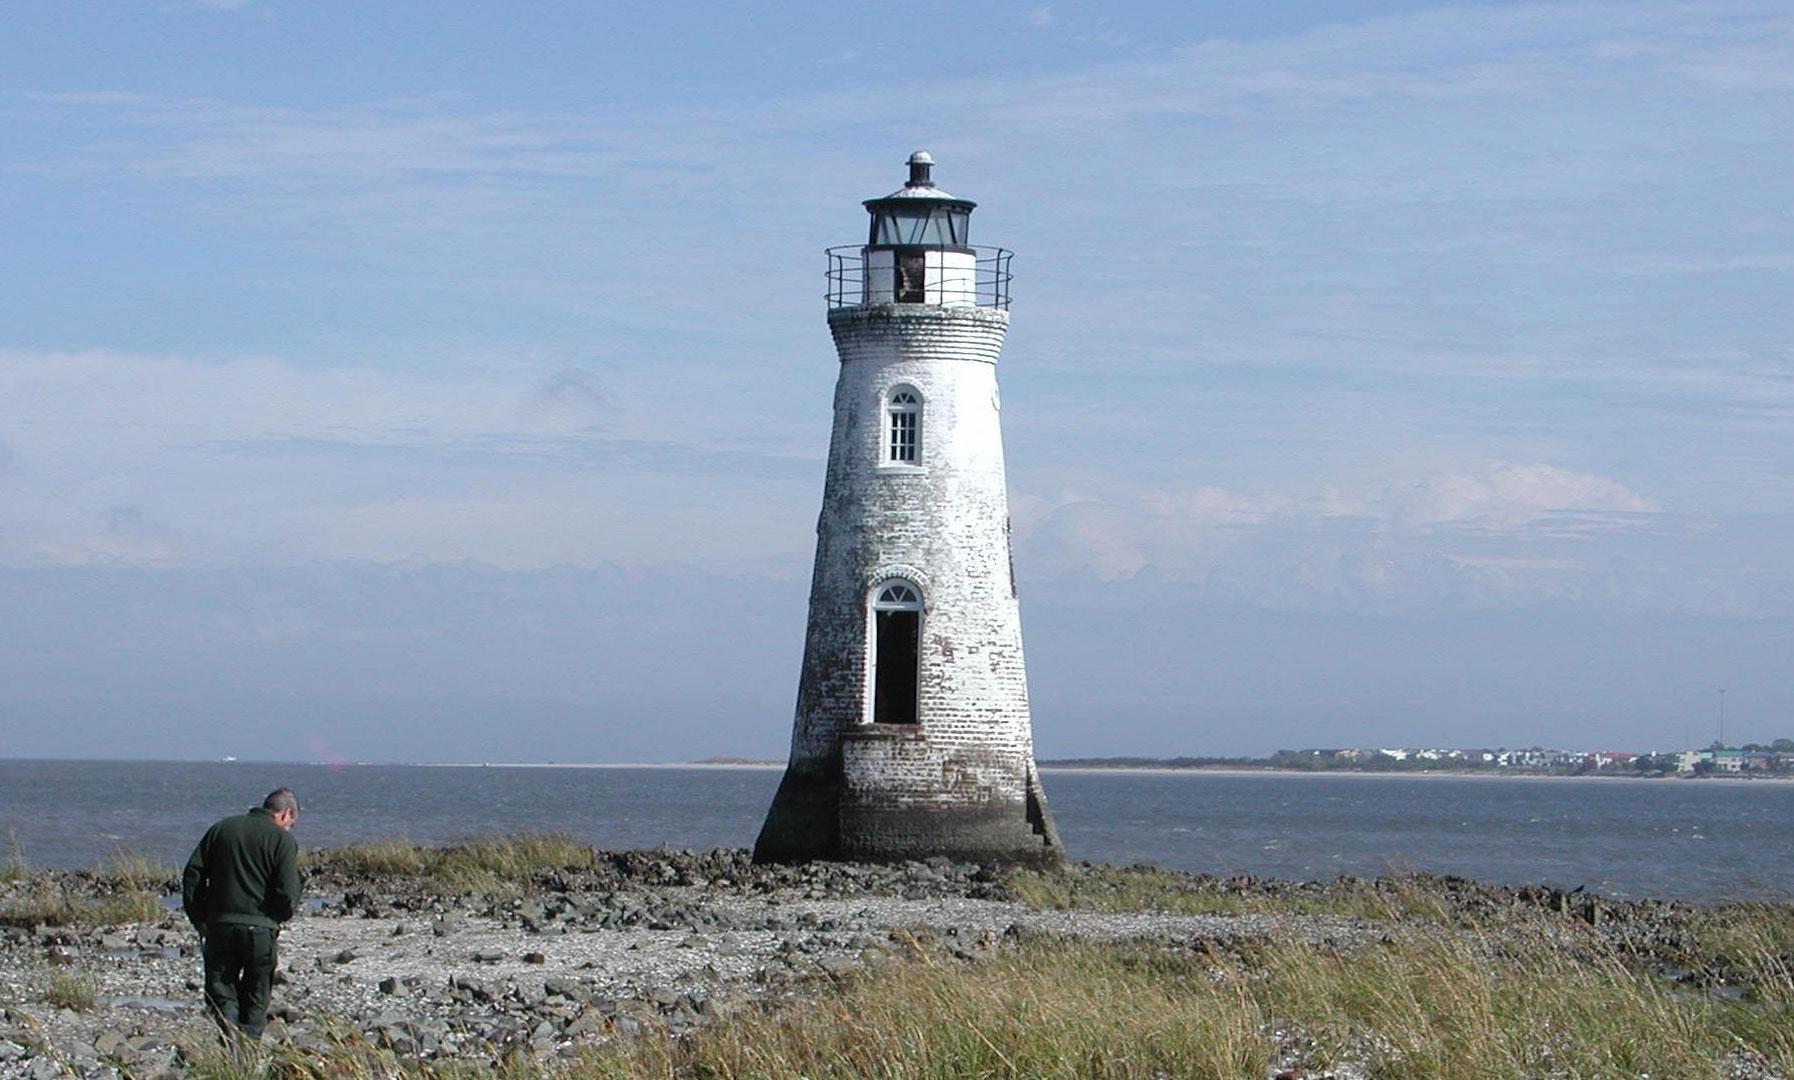 Cockspur Island Lighthouse - Fort Pulaski National Monument (U.S. ...